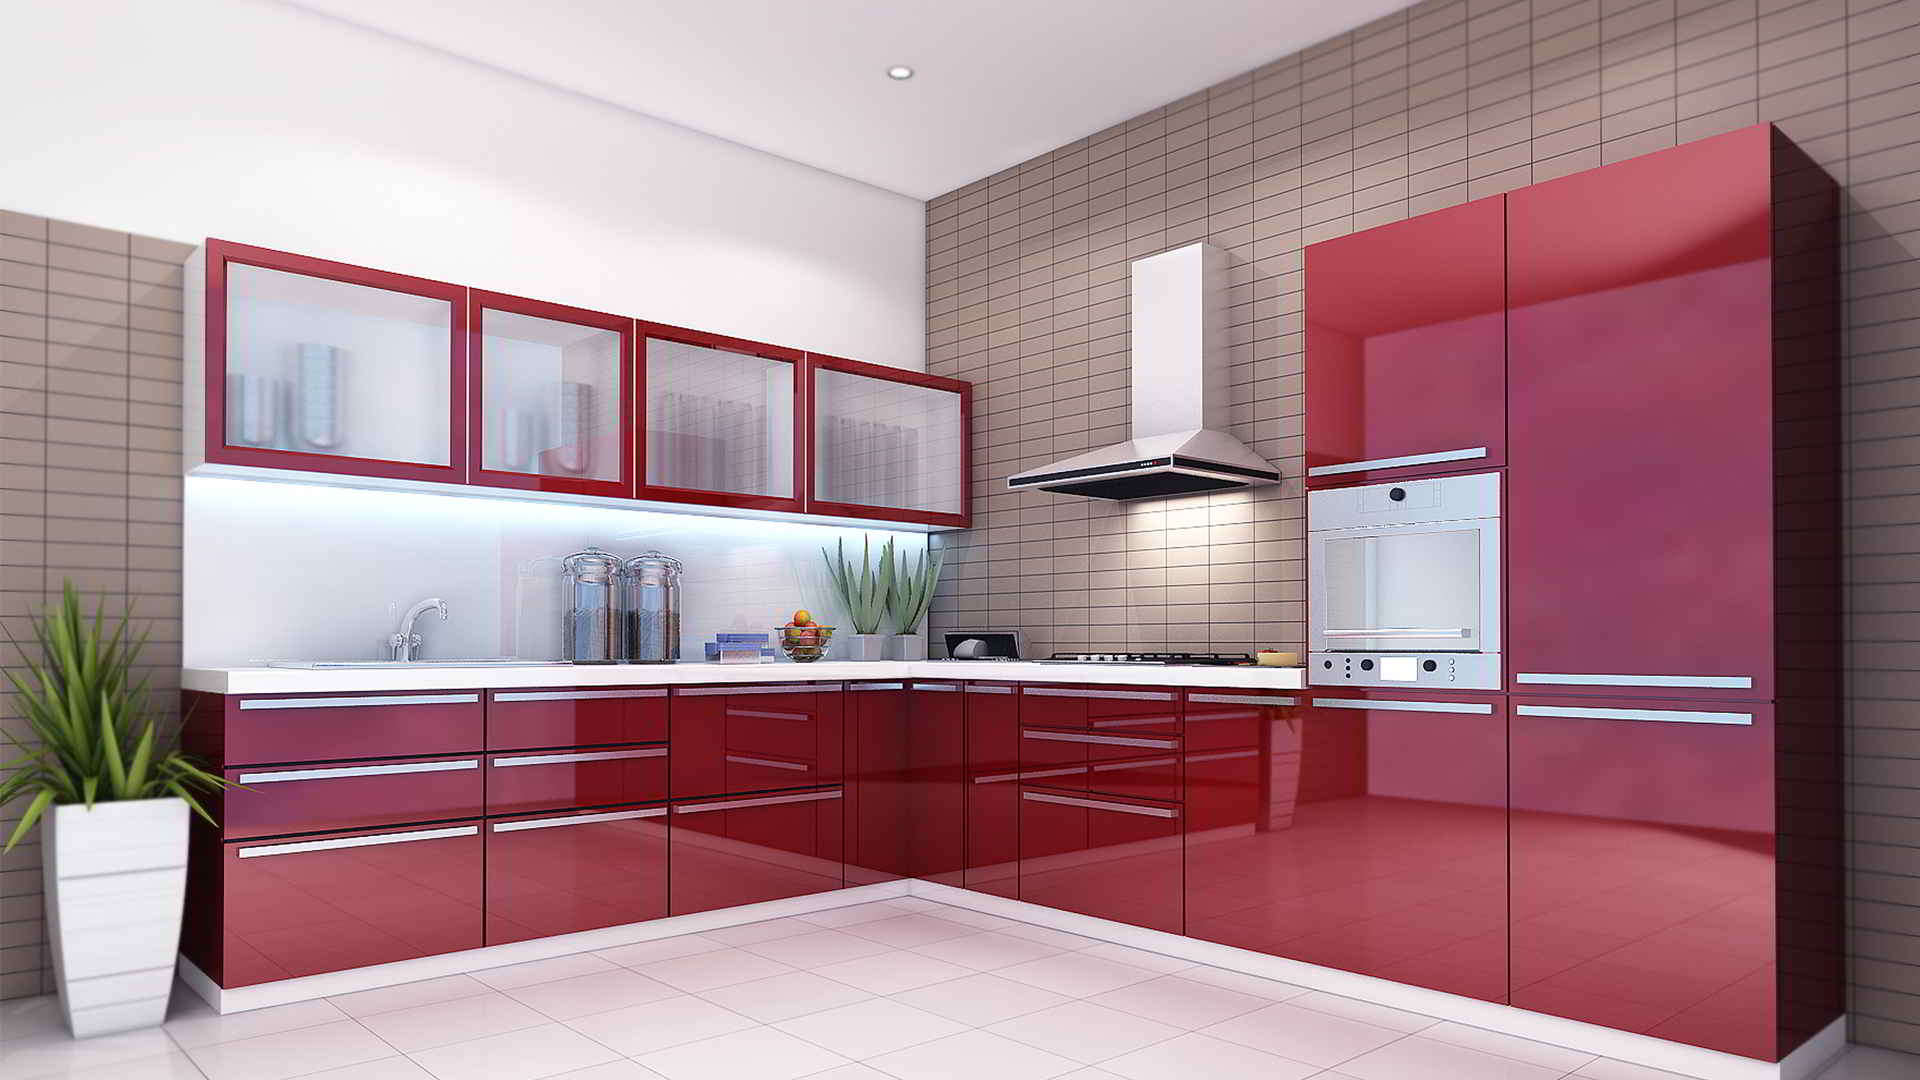 modular kitchen kitchen 2 TKQJEYN